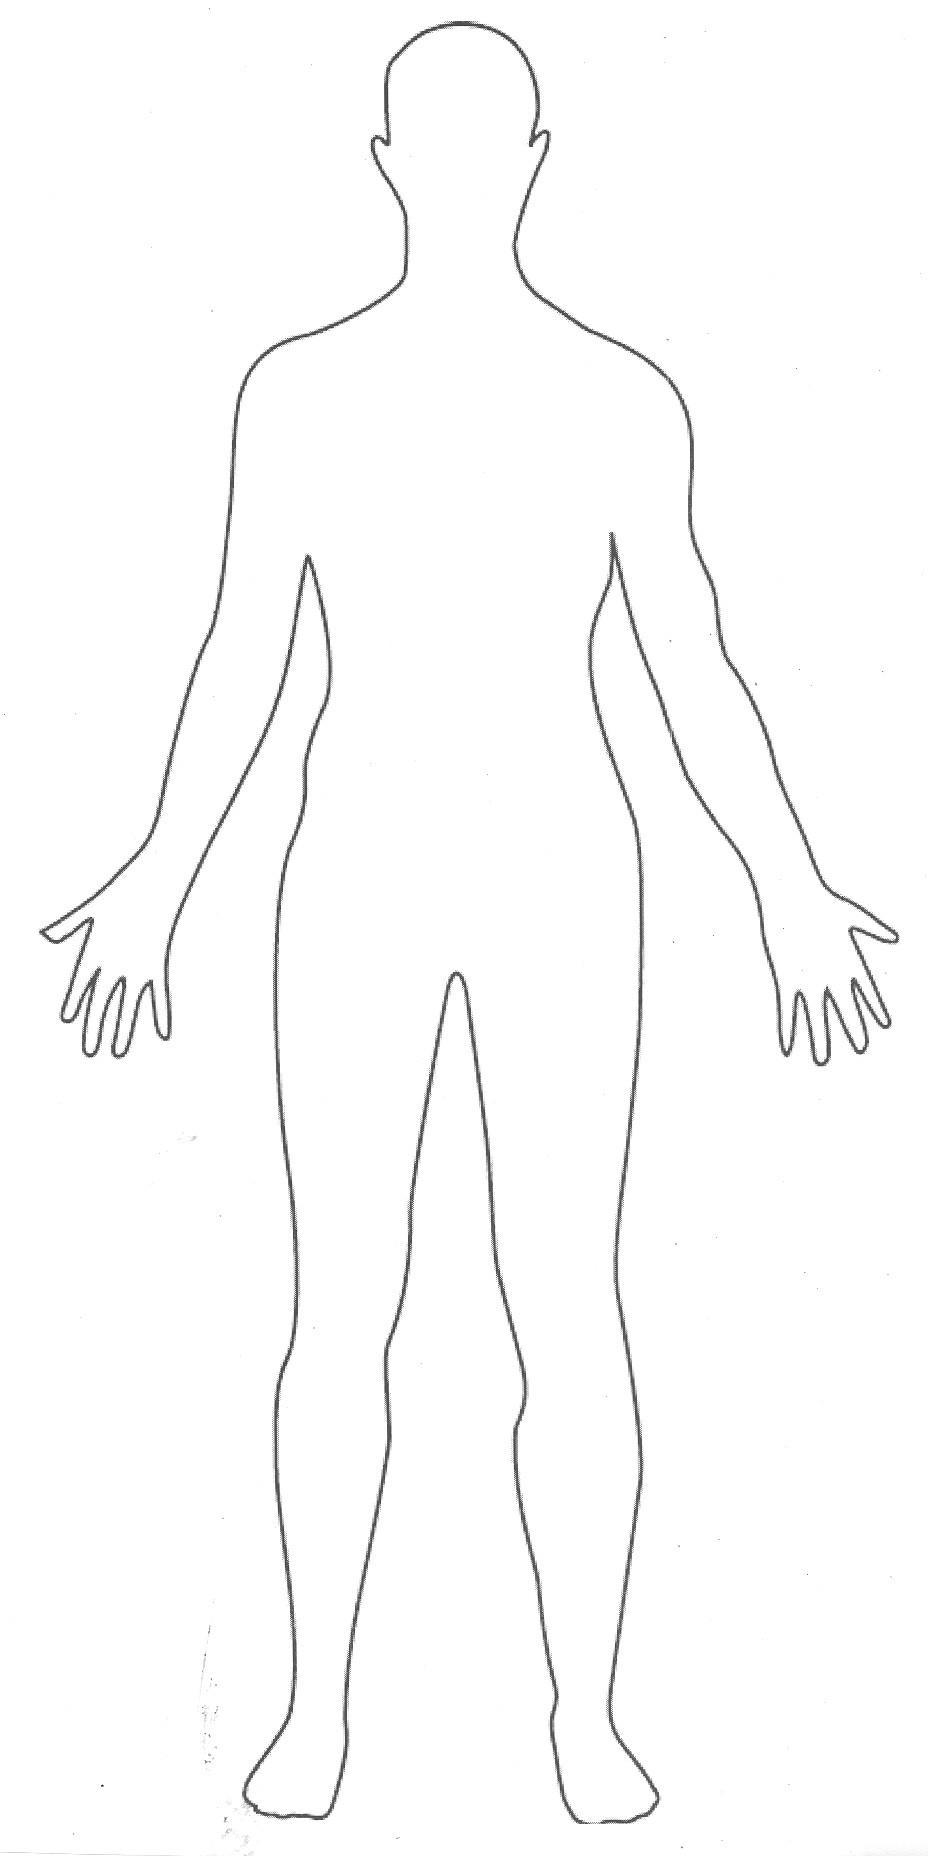 Human Body-Human Body-17